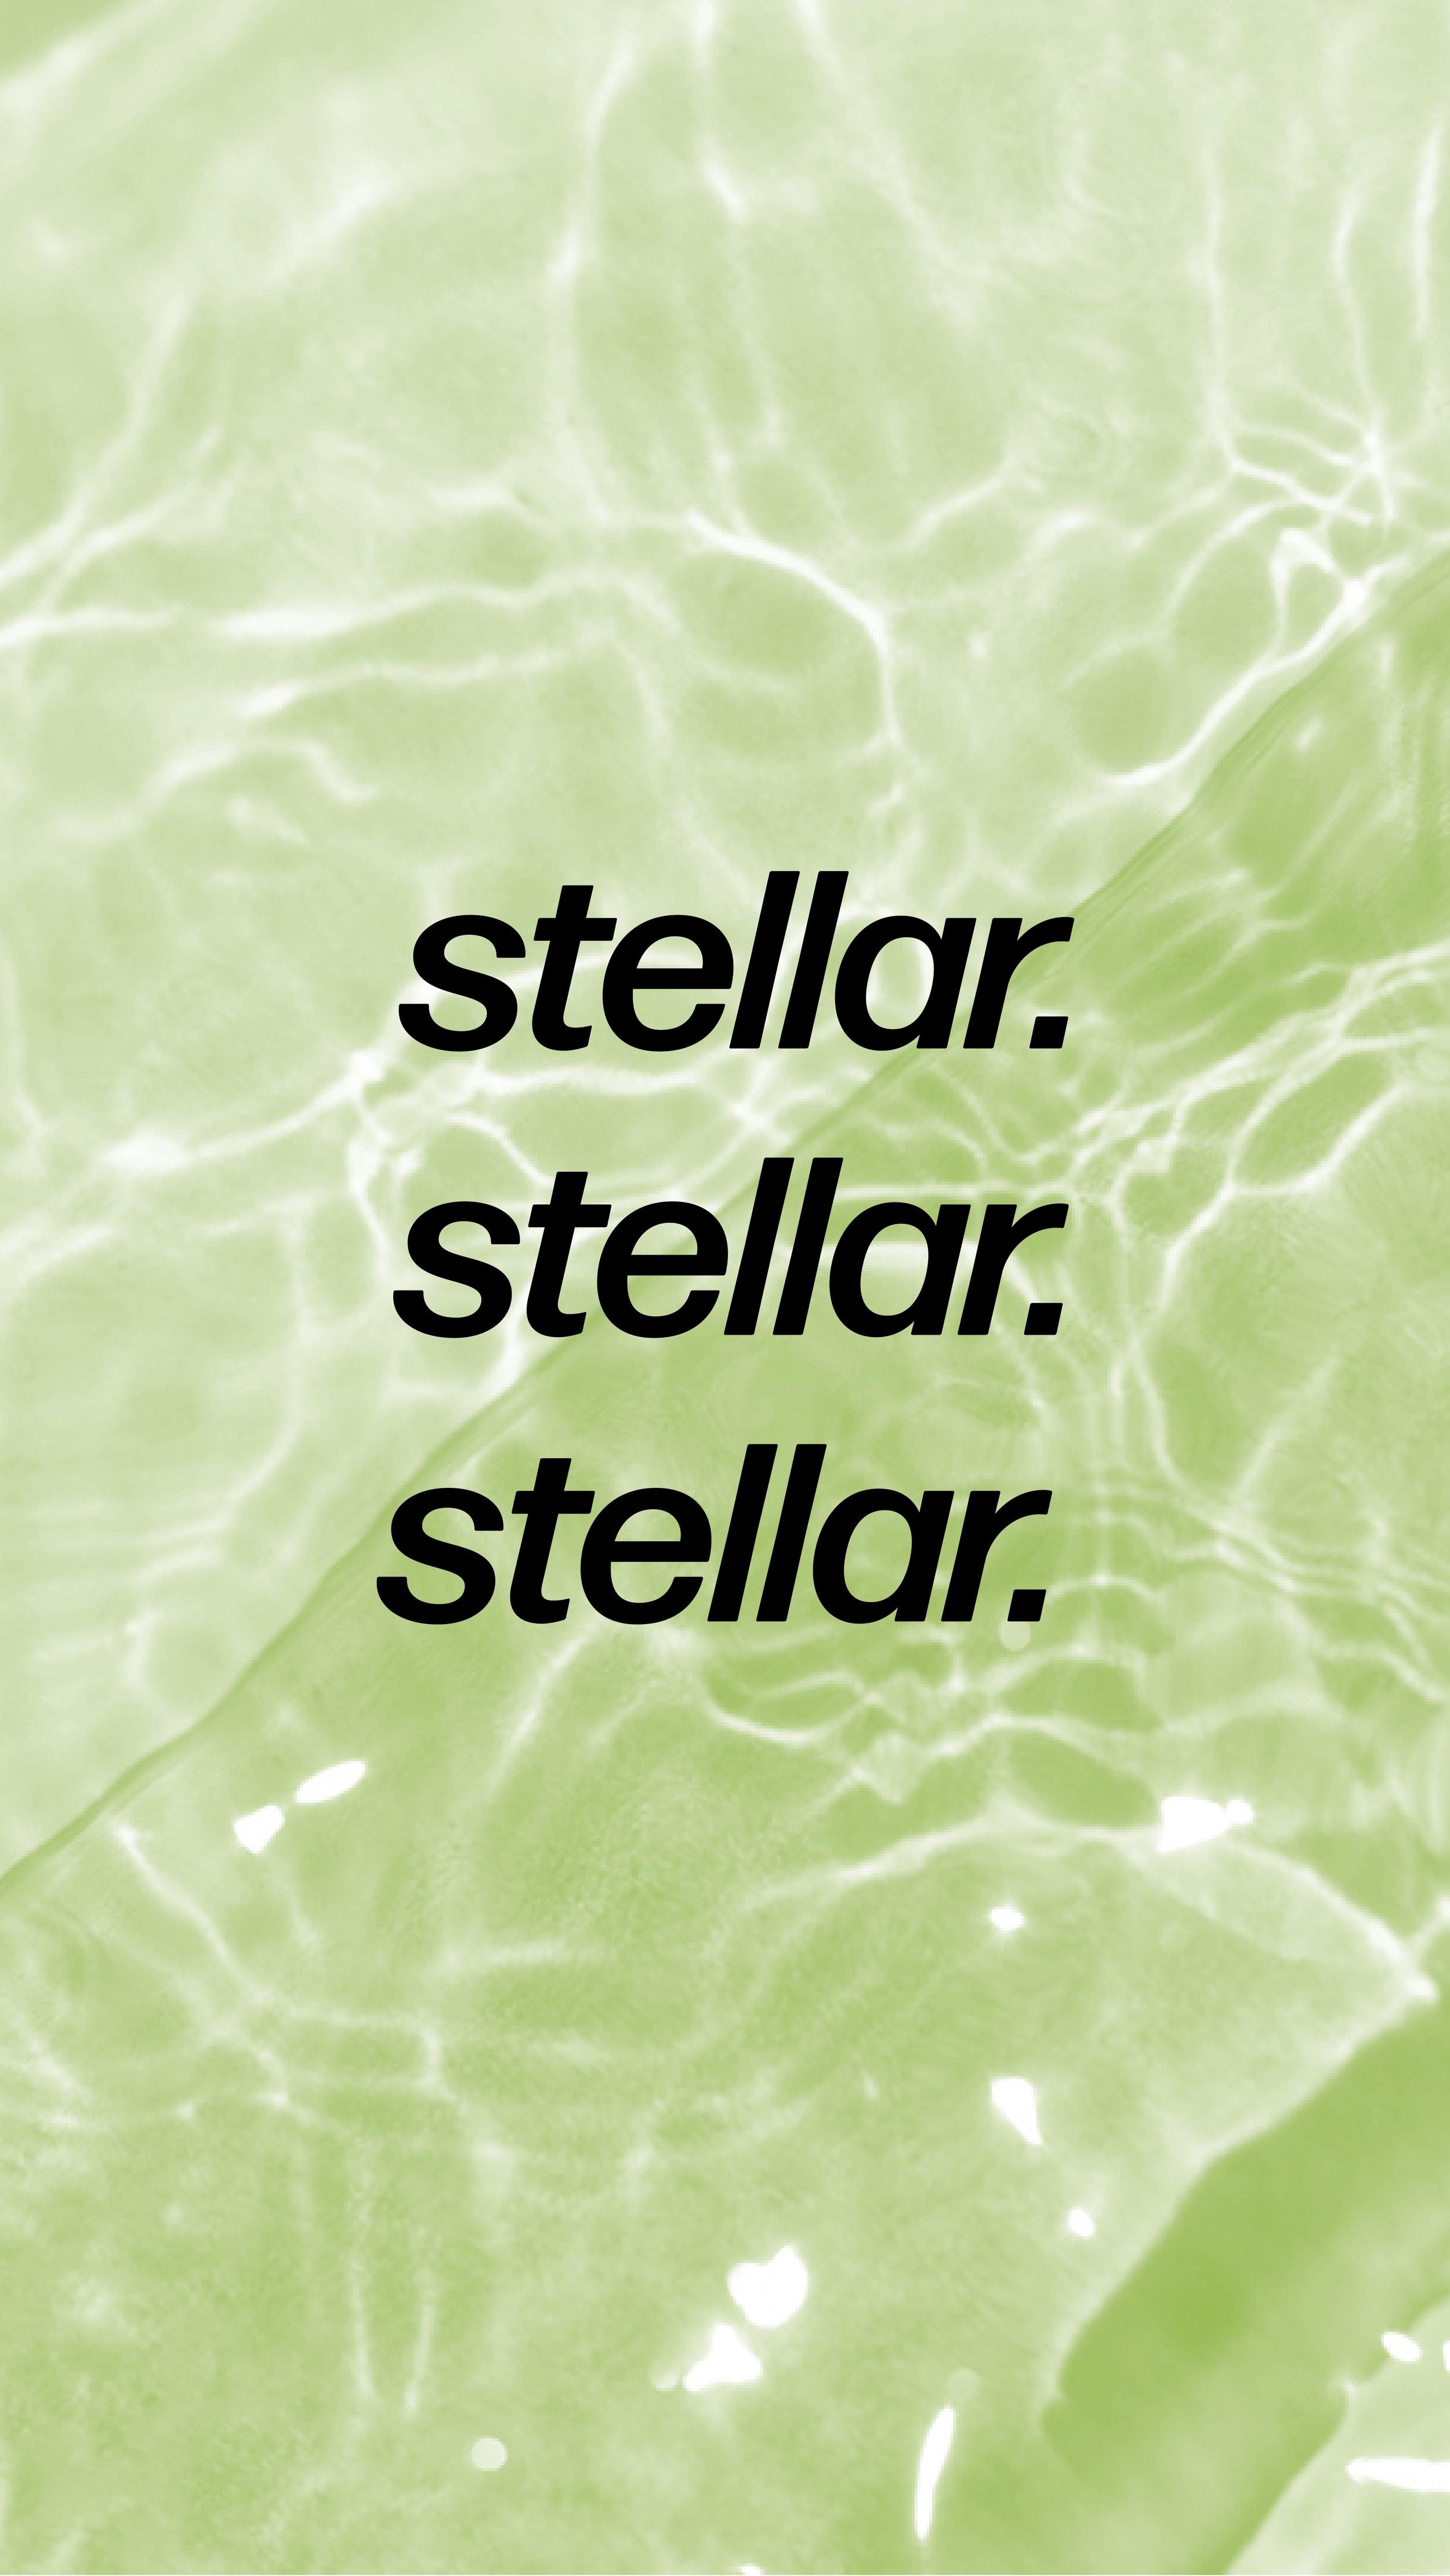 stellar_show-11.png